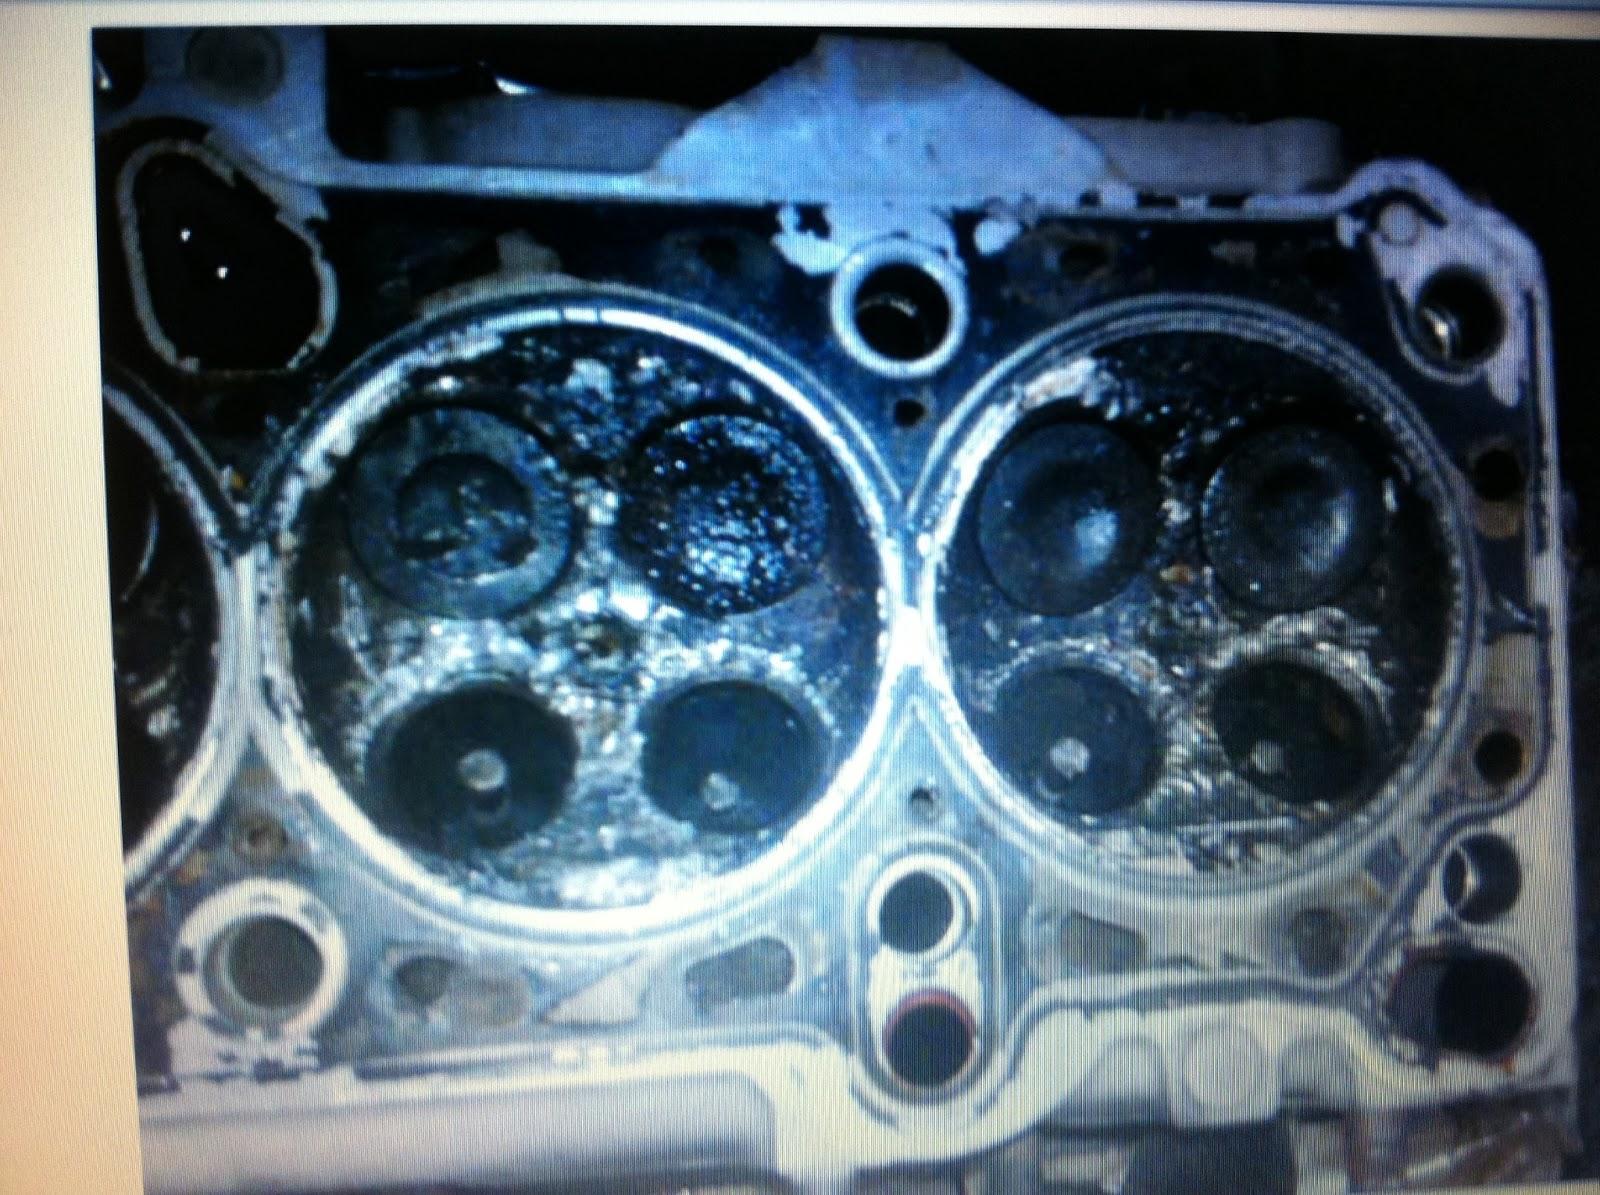 Pareasi 4tak World Class Manufacturing Chrysler The